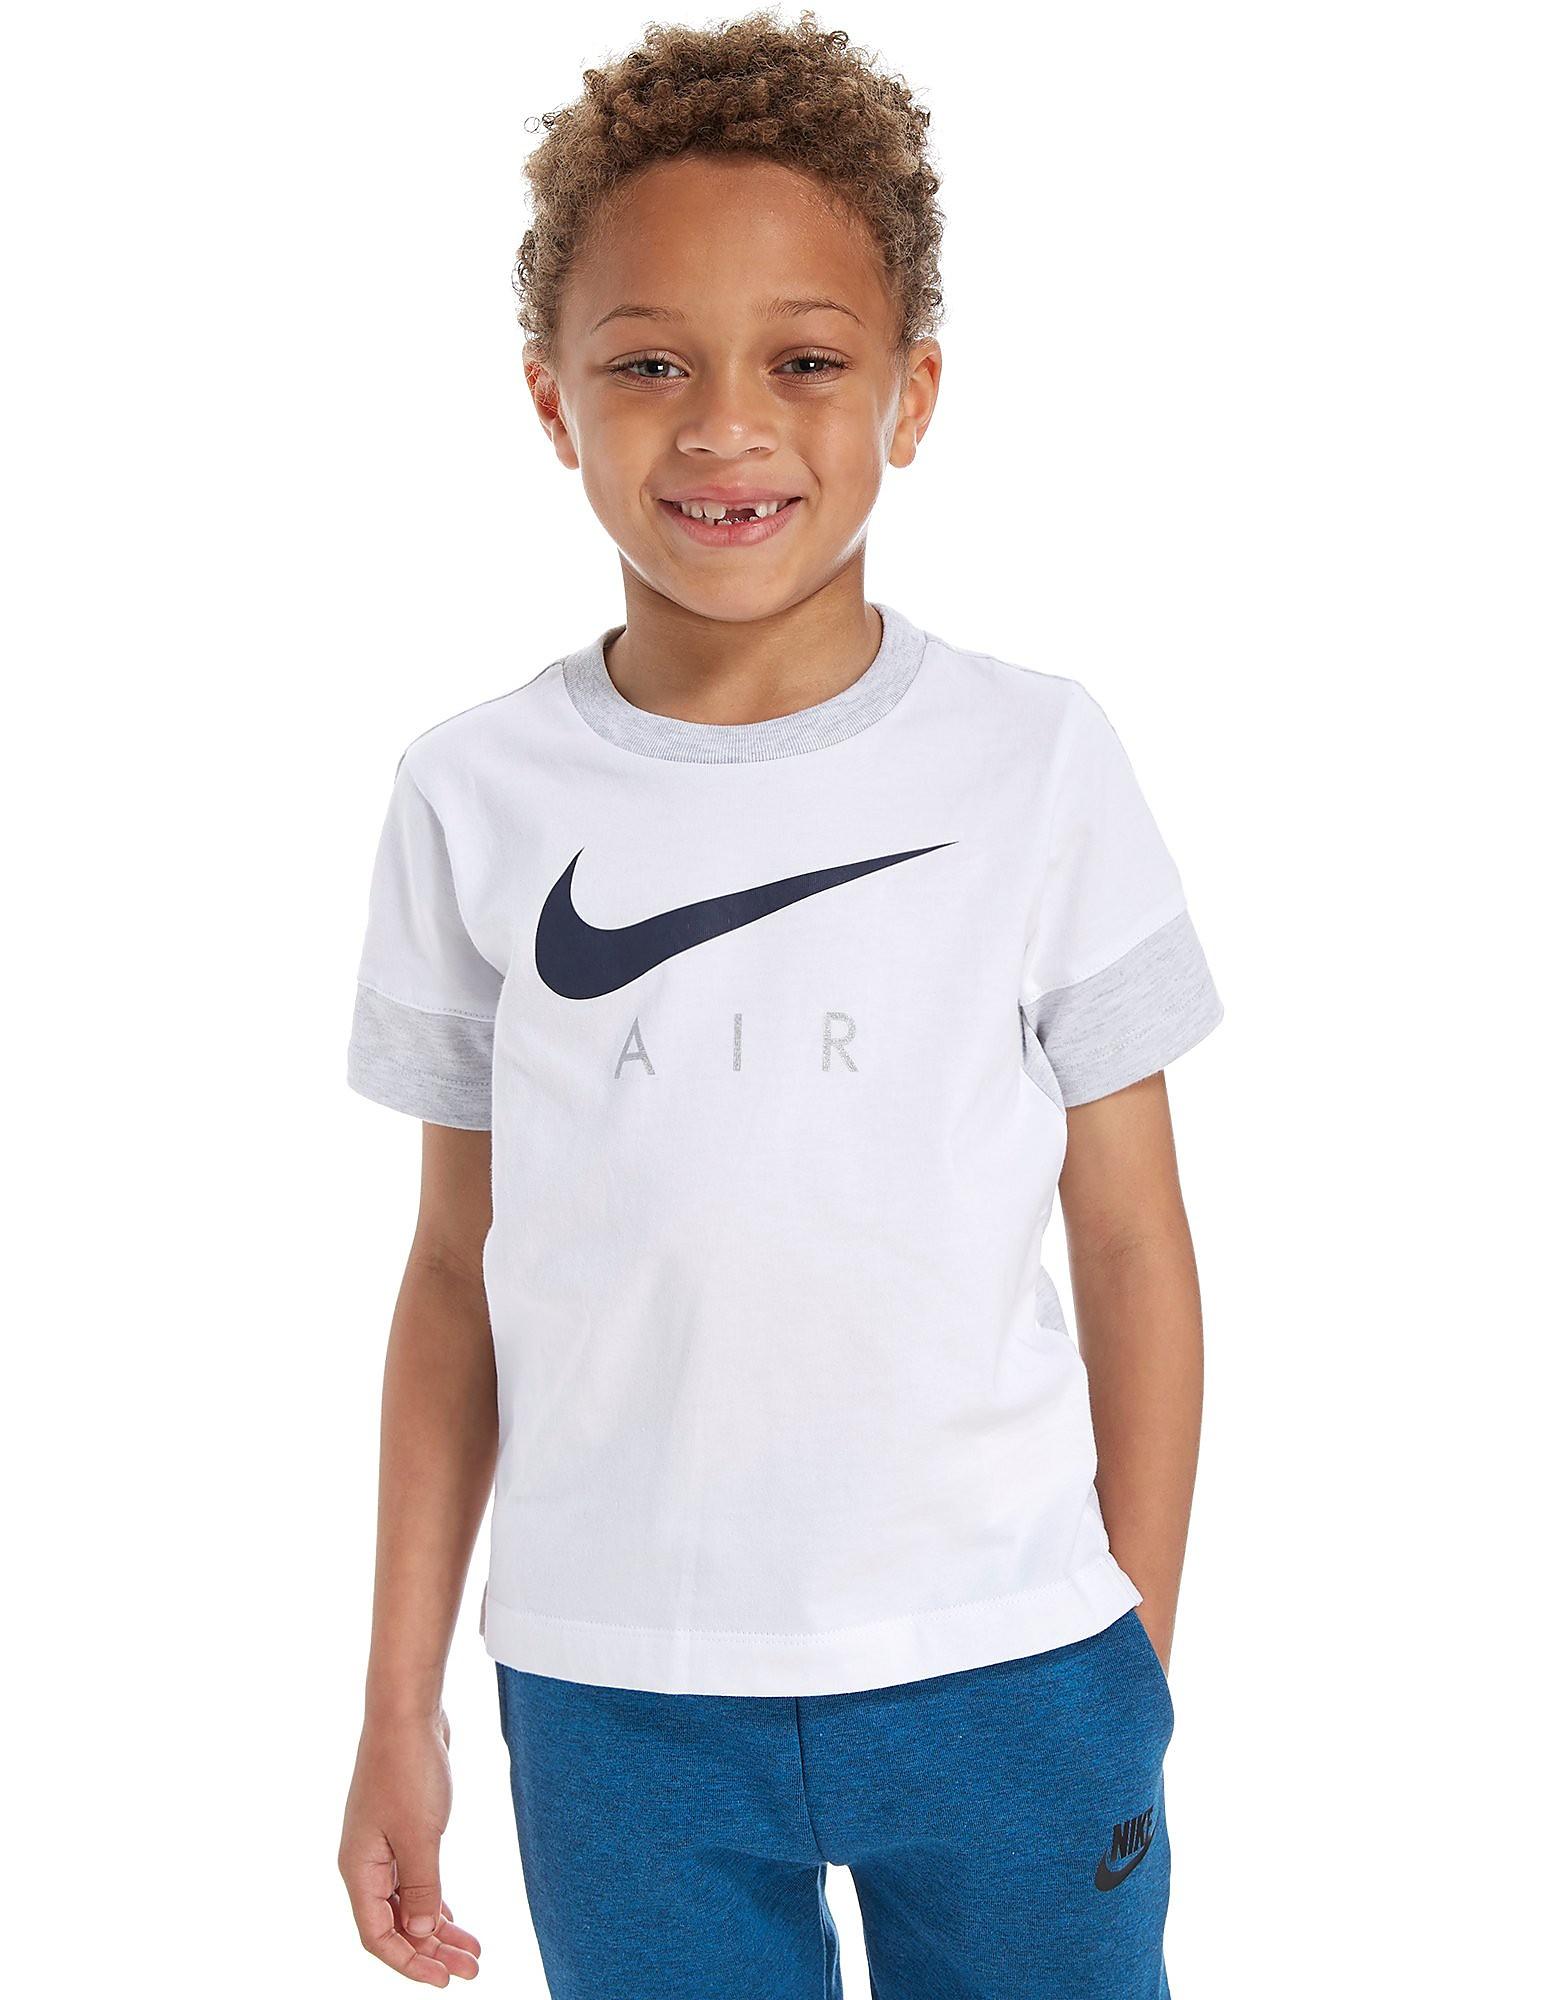 Nike Air T-Shirt Kinderen